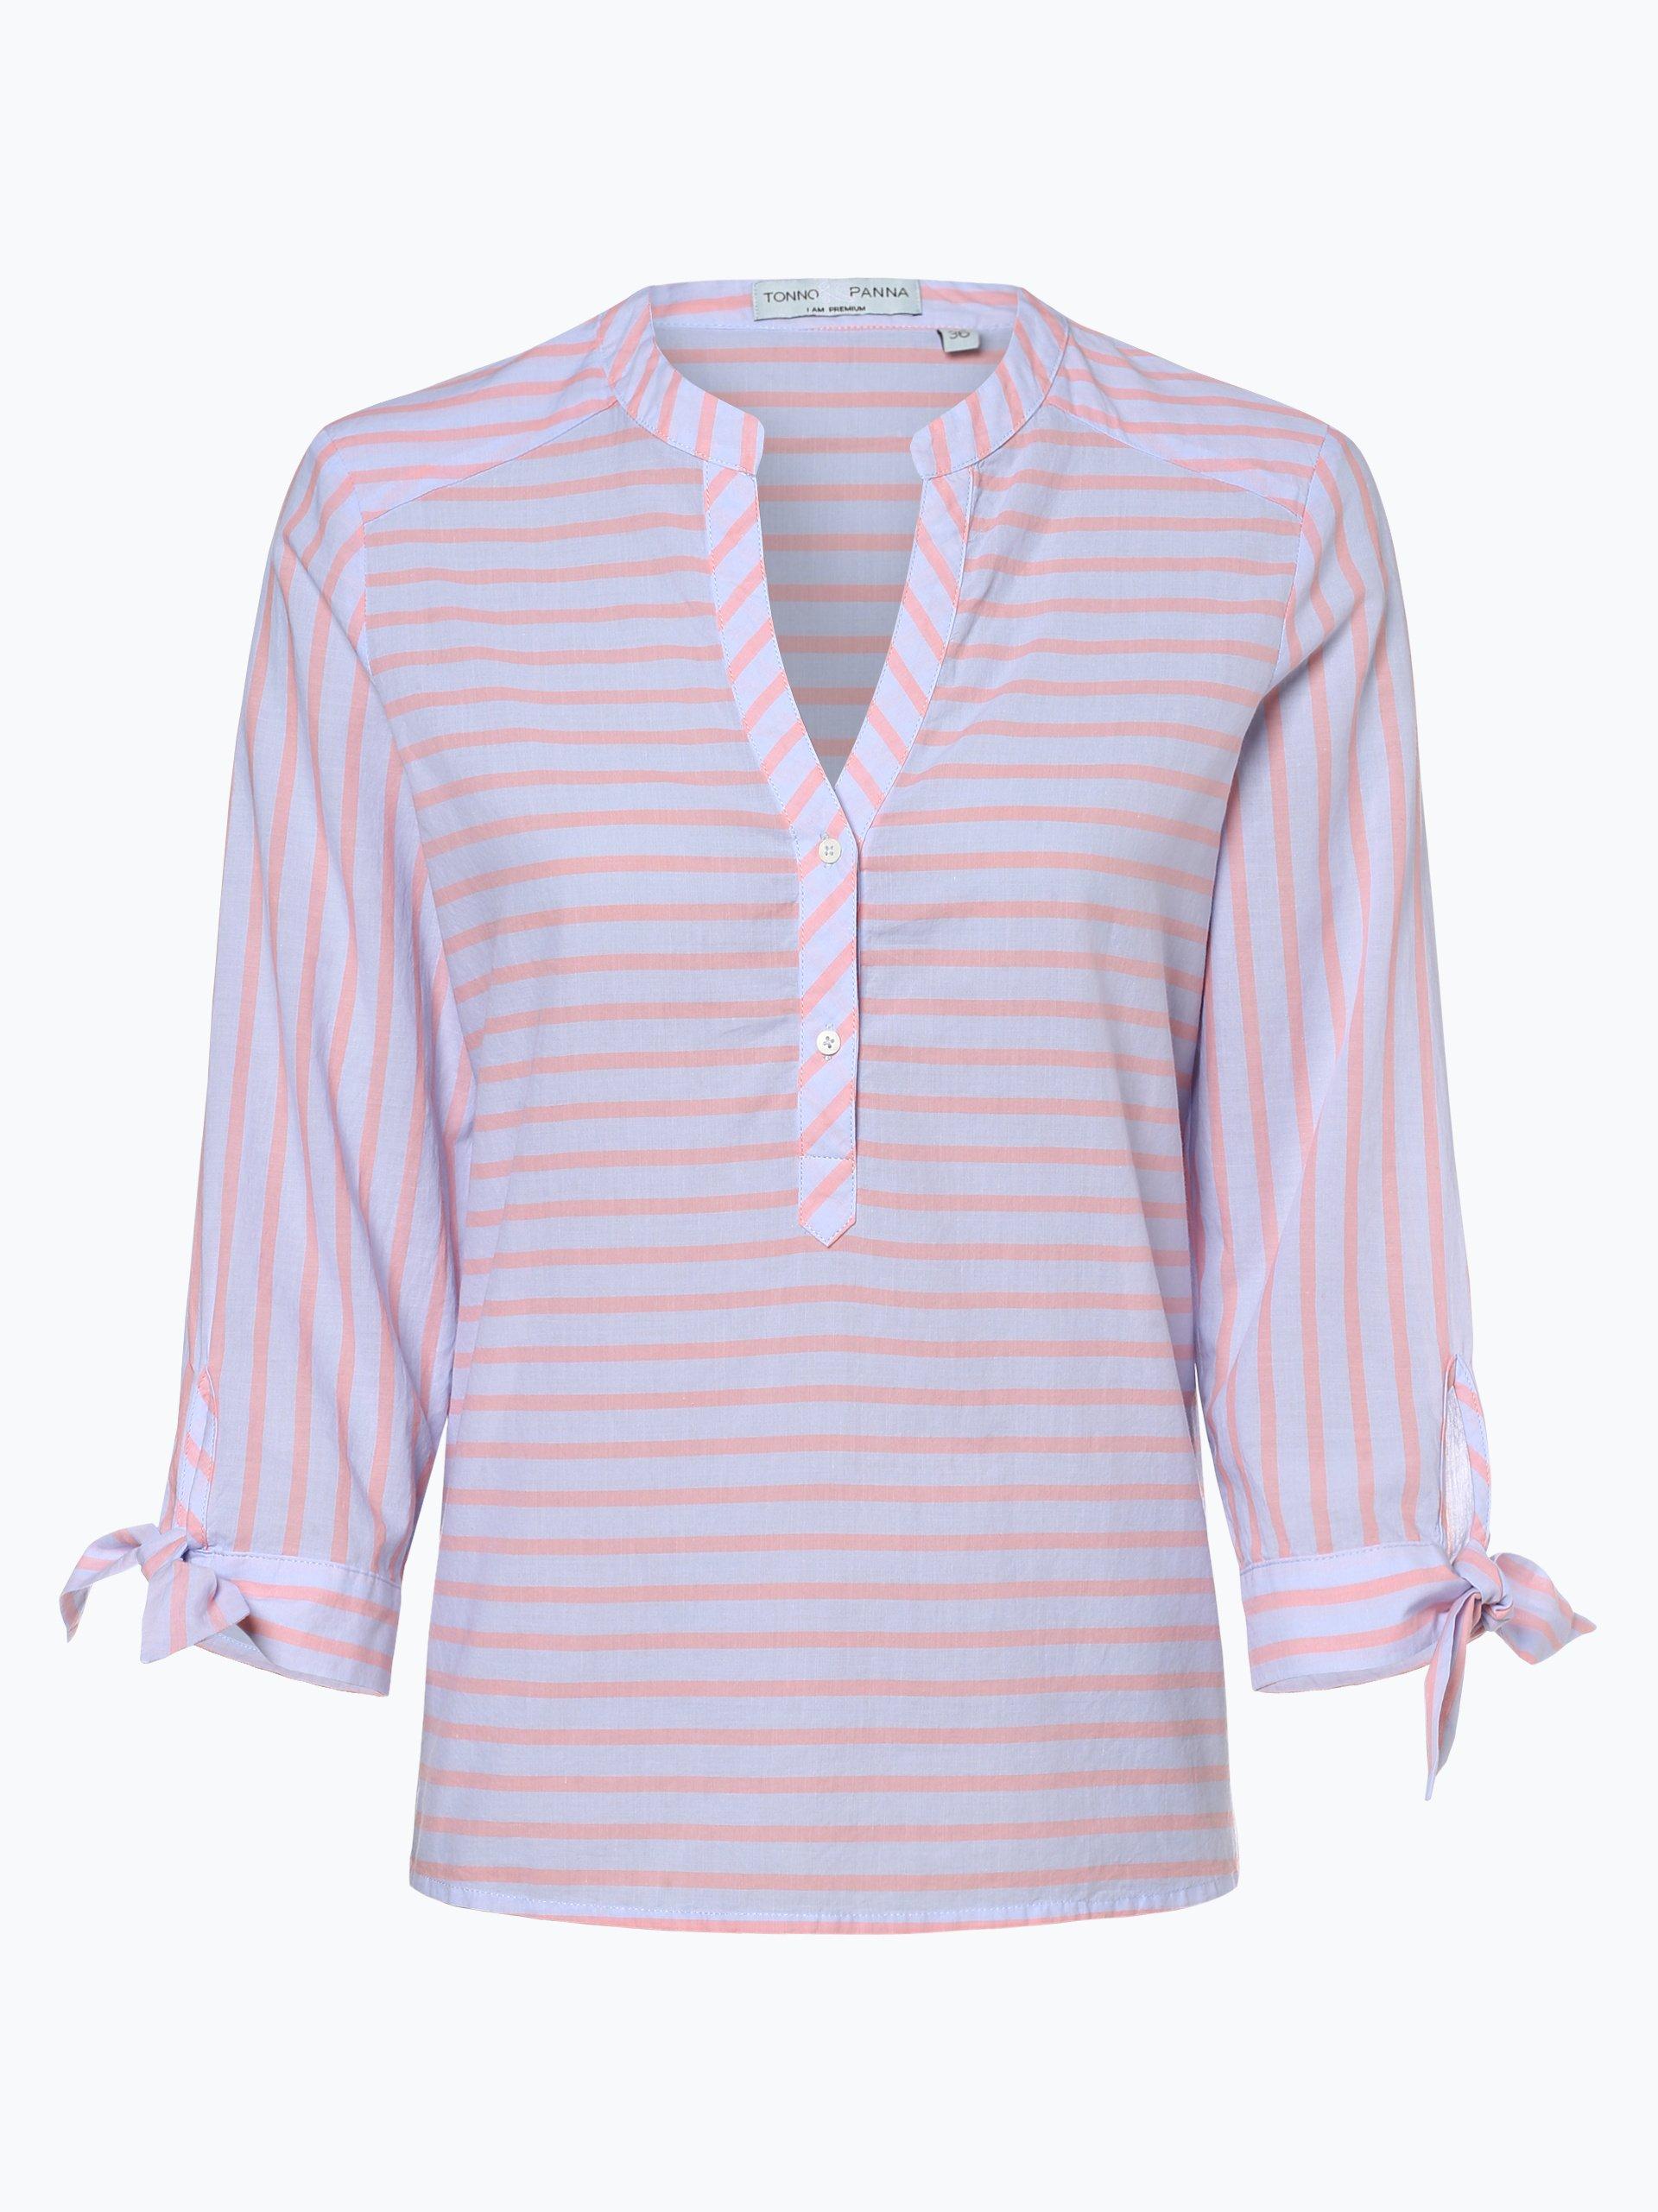 Tonno & Panna Damen Bluse